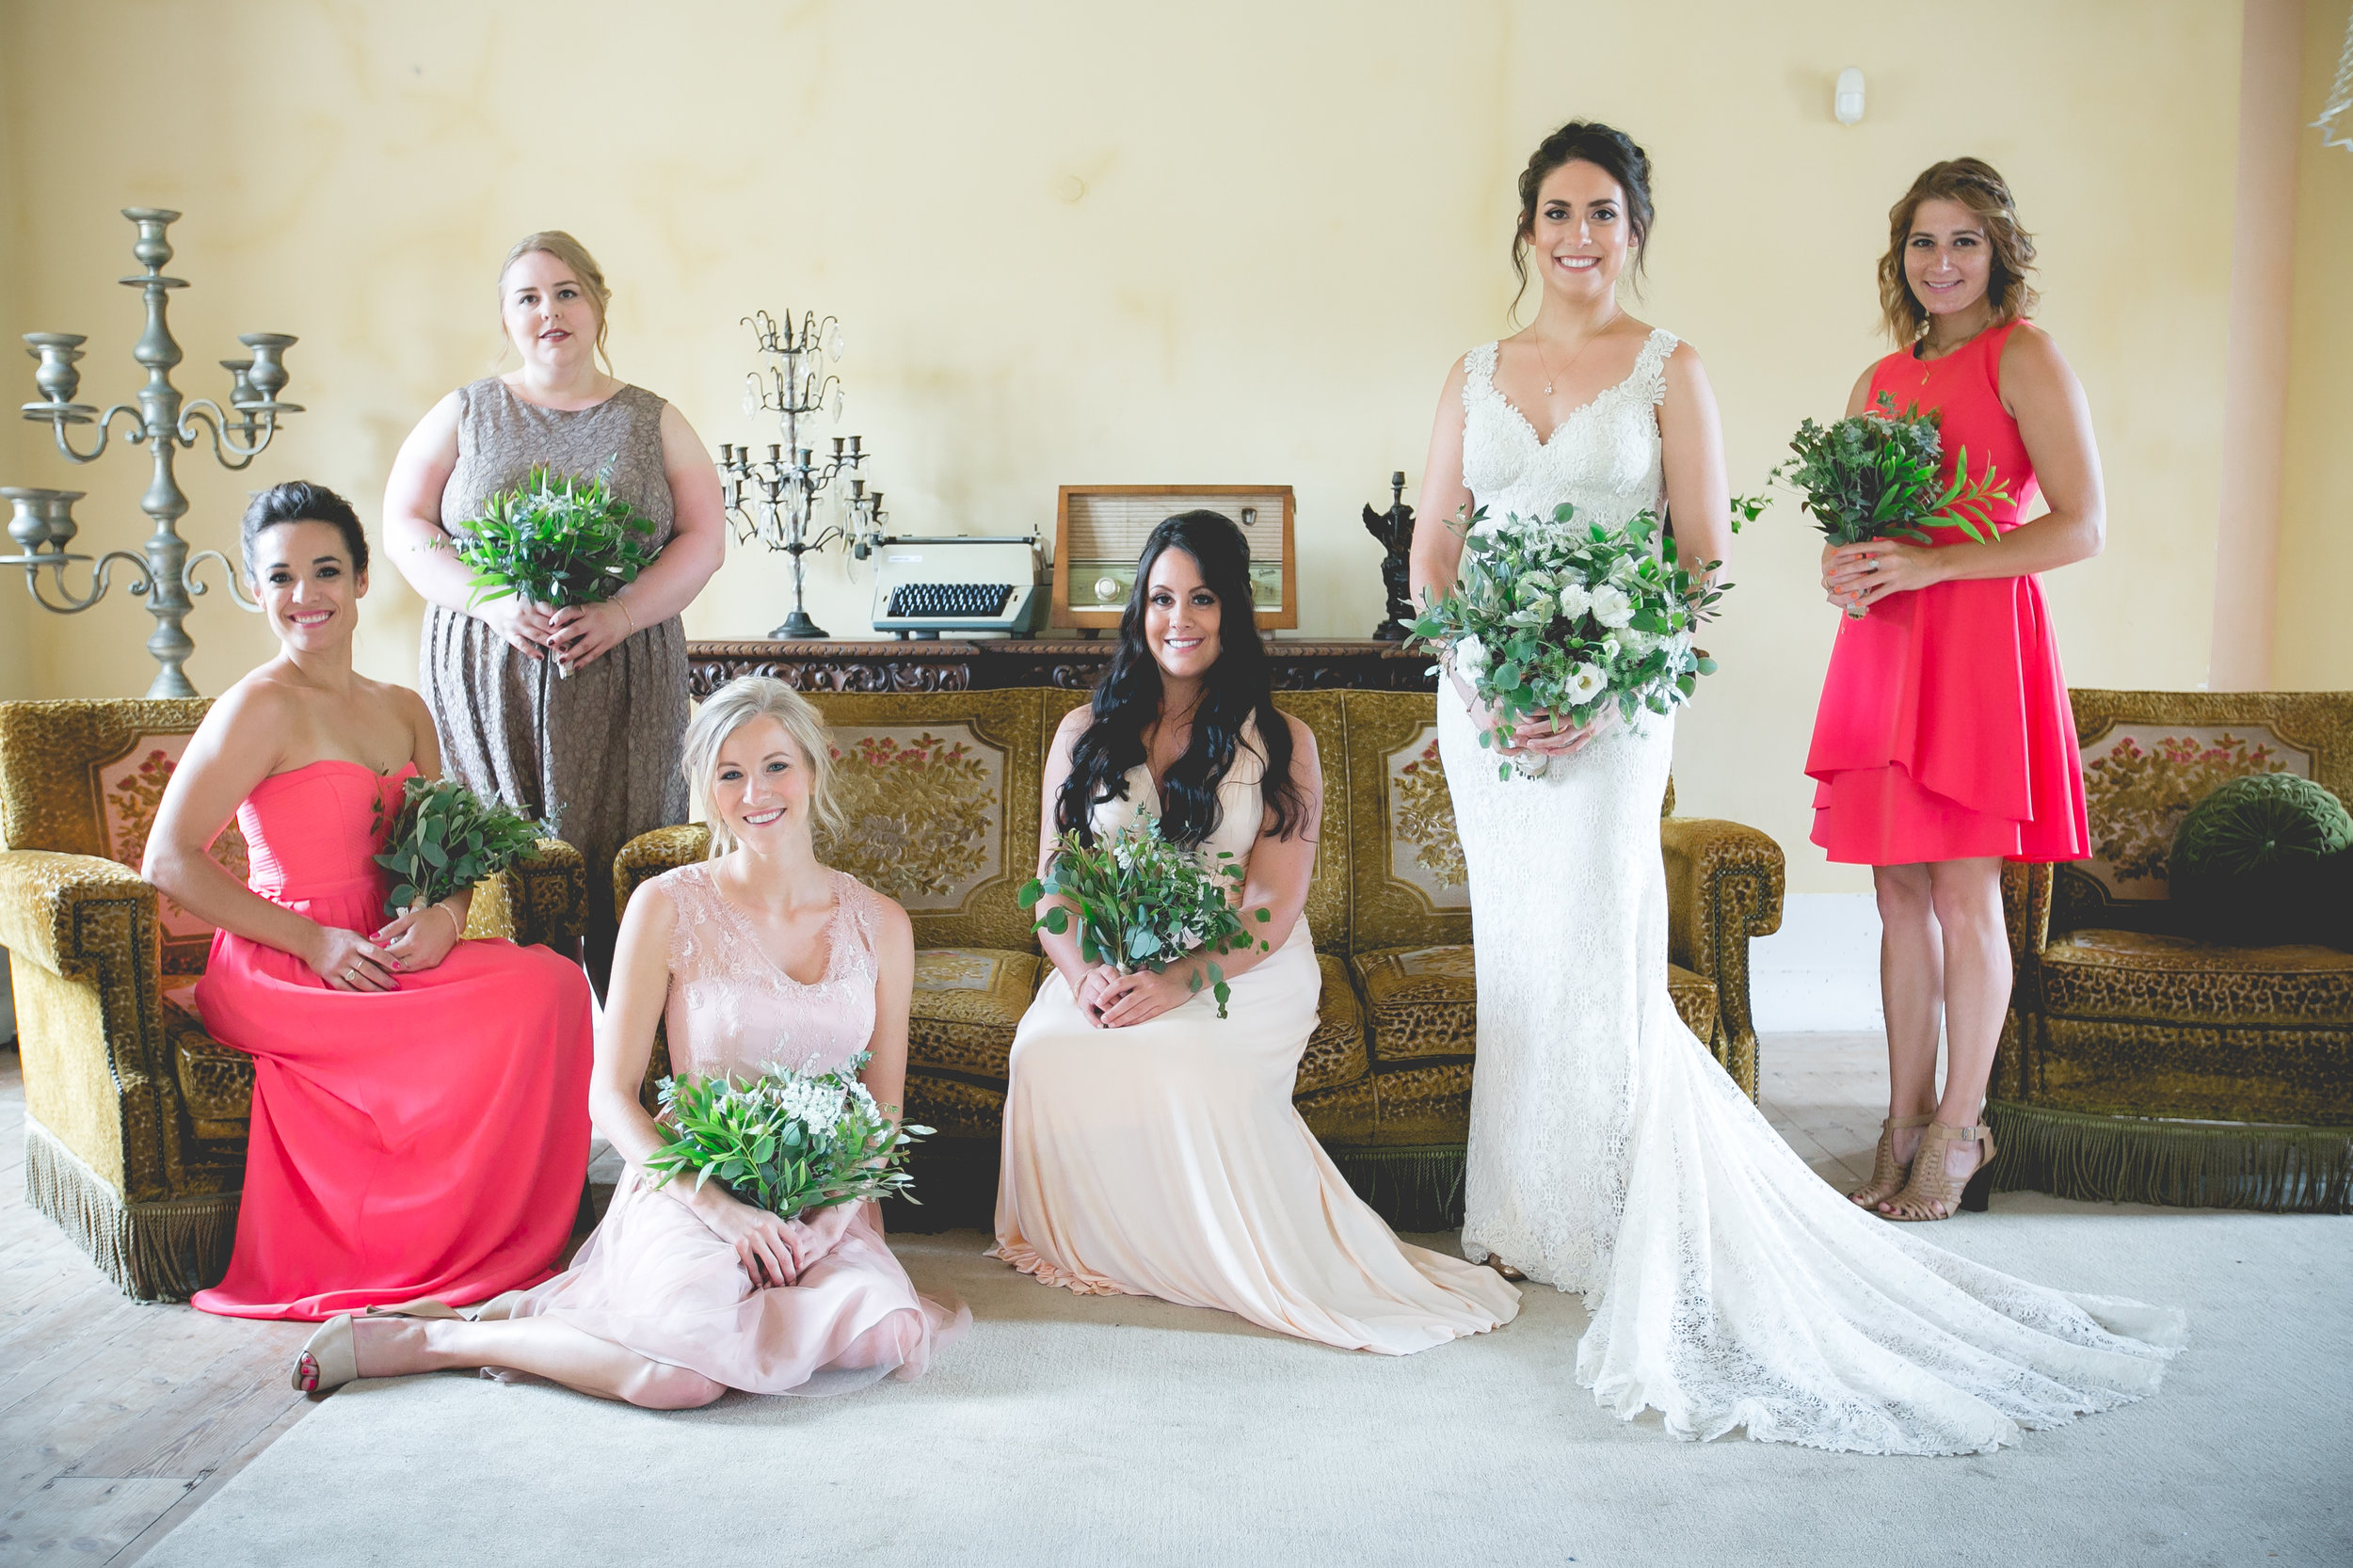 Monserrate Palace Portugal Destination Wedding Bridesmaids Vanity Fair